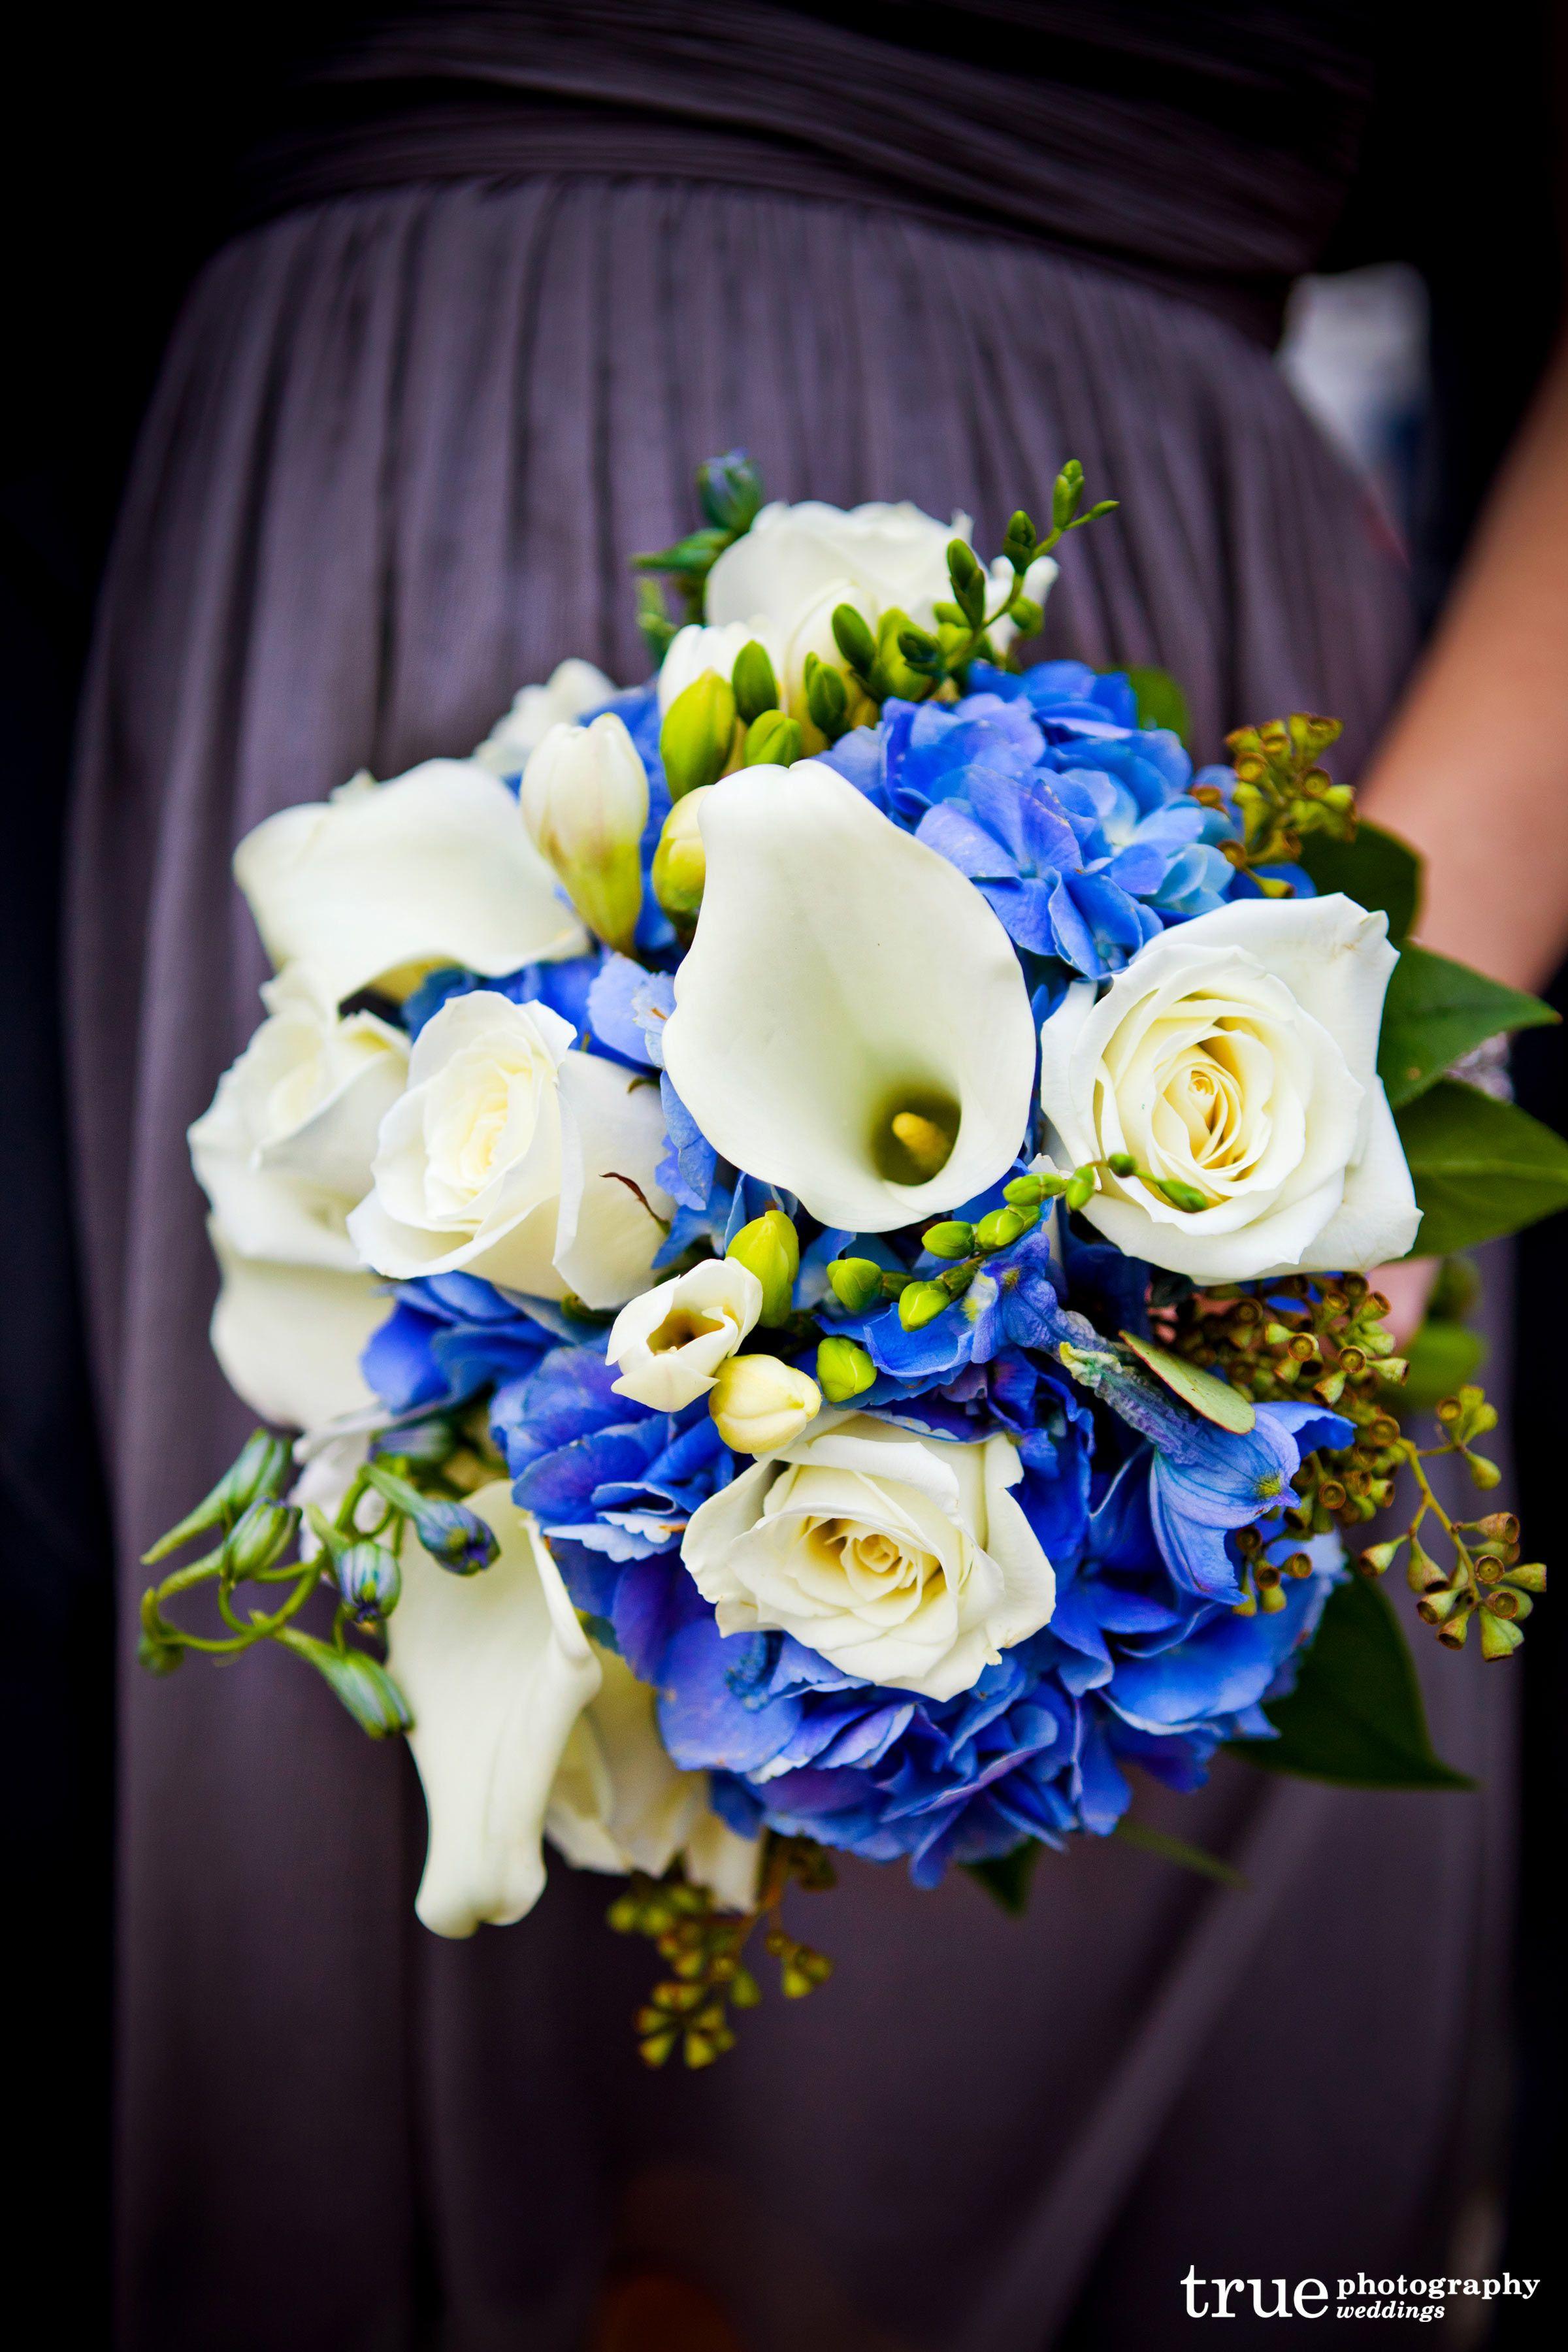 Hydrangea Rose Navy Light Blue Artificial Wedding Bouquets ... |Light Blue Hydrangea Bouquet